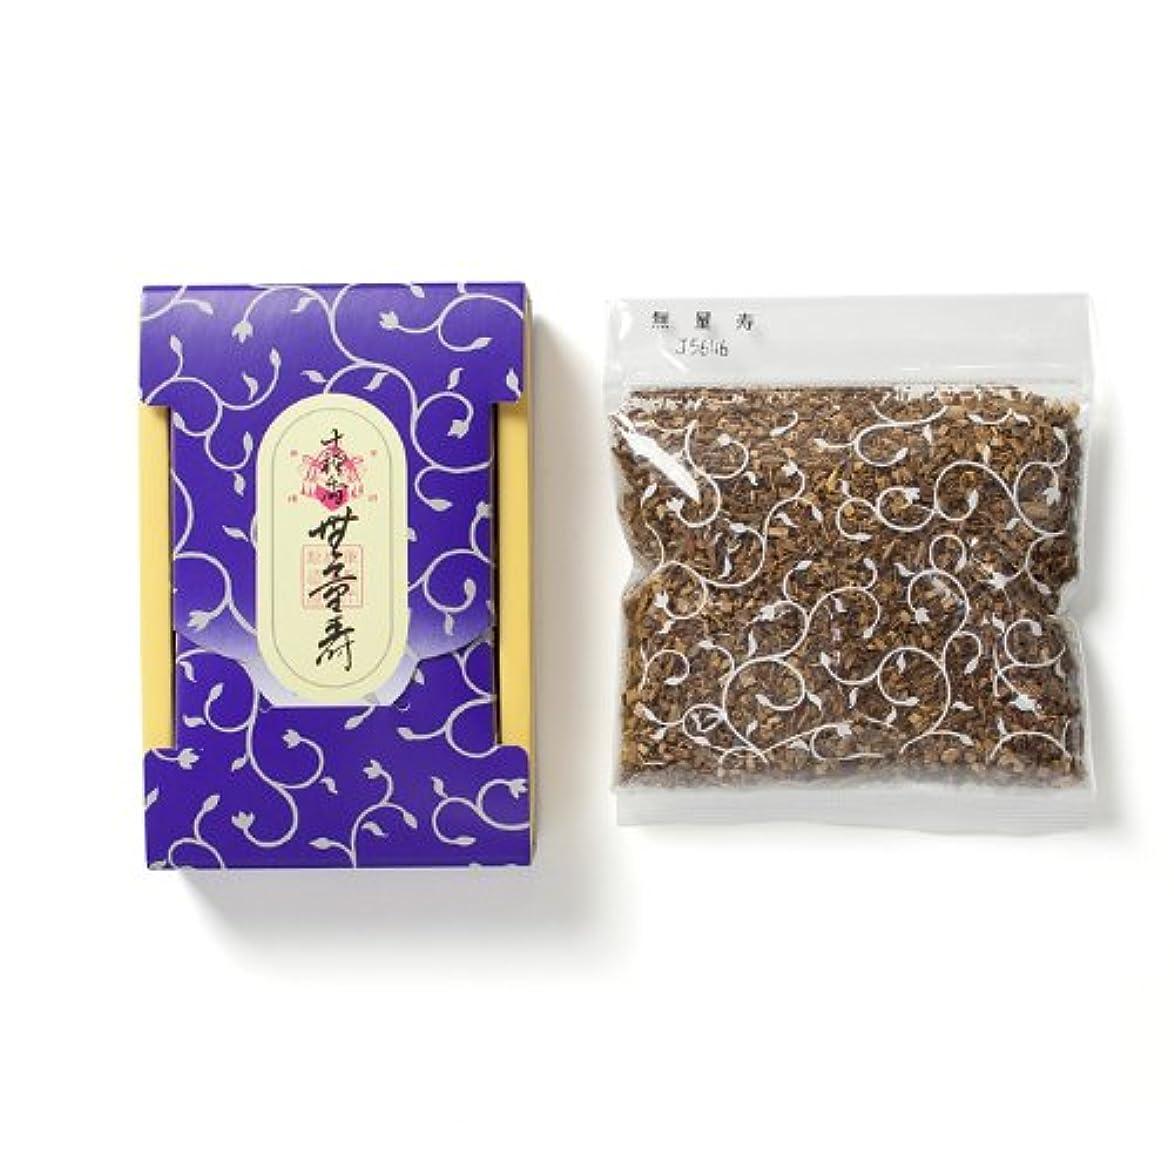 行商人責め提供松栄堂のお焼香 十種香 無量寿 25g詰 小箱入 #410841